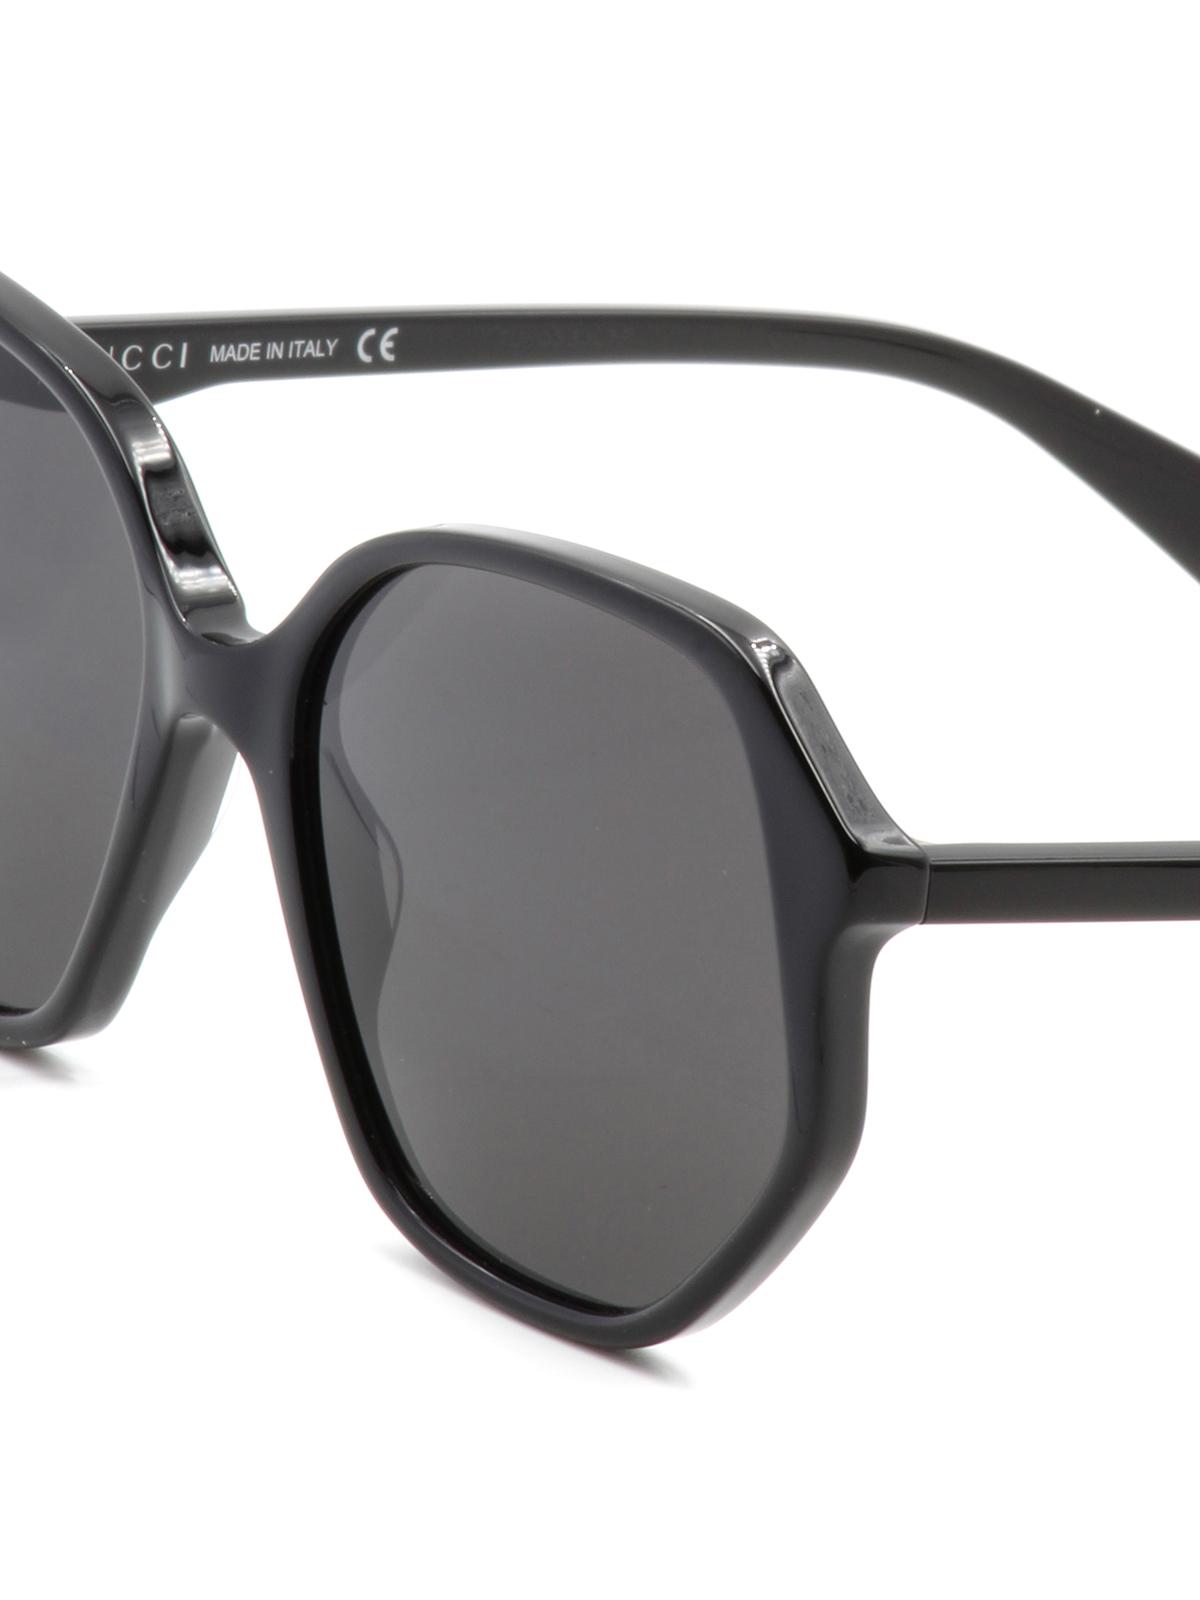 3dd25ac69 Gucci - Black geometric sunglasses - sunglasses - GG0258S1 |  www.artofmikemignola.com. Blog da LebehPromoção Black Friday: Bolsa Gucci  Preta Bambu ...